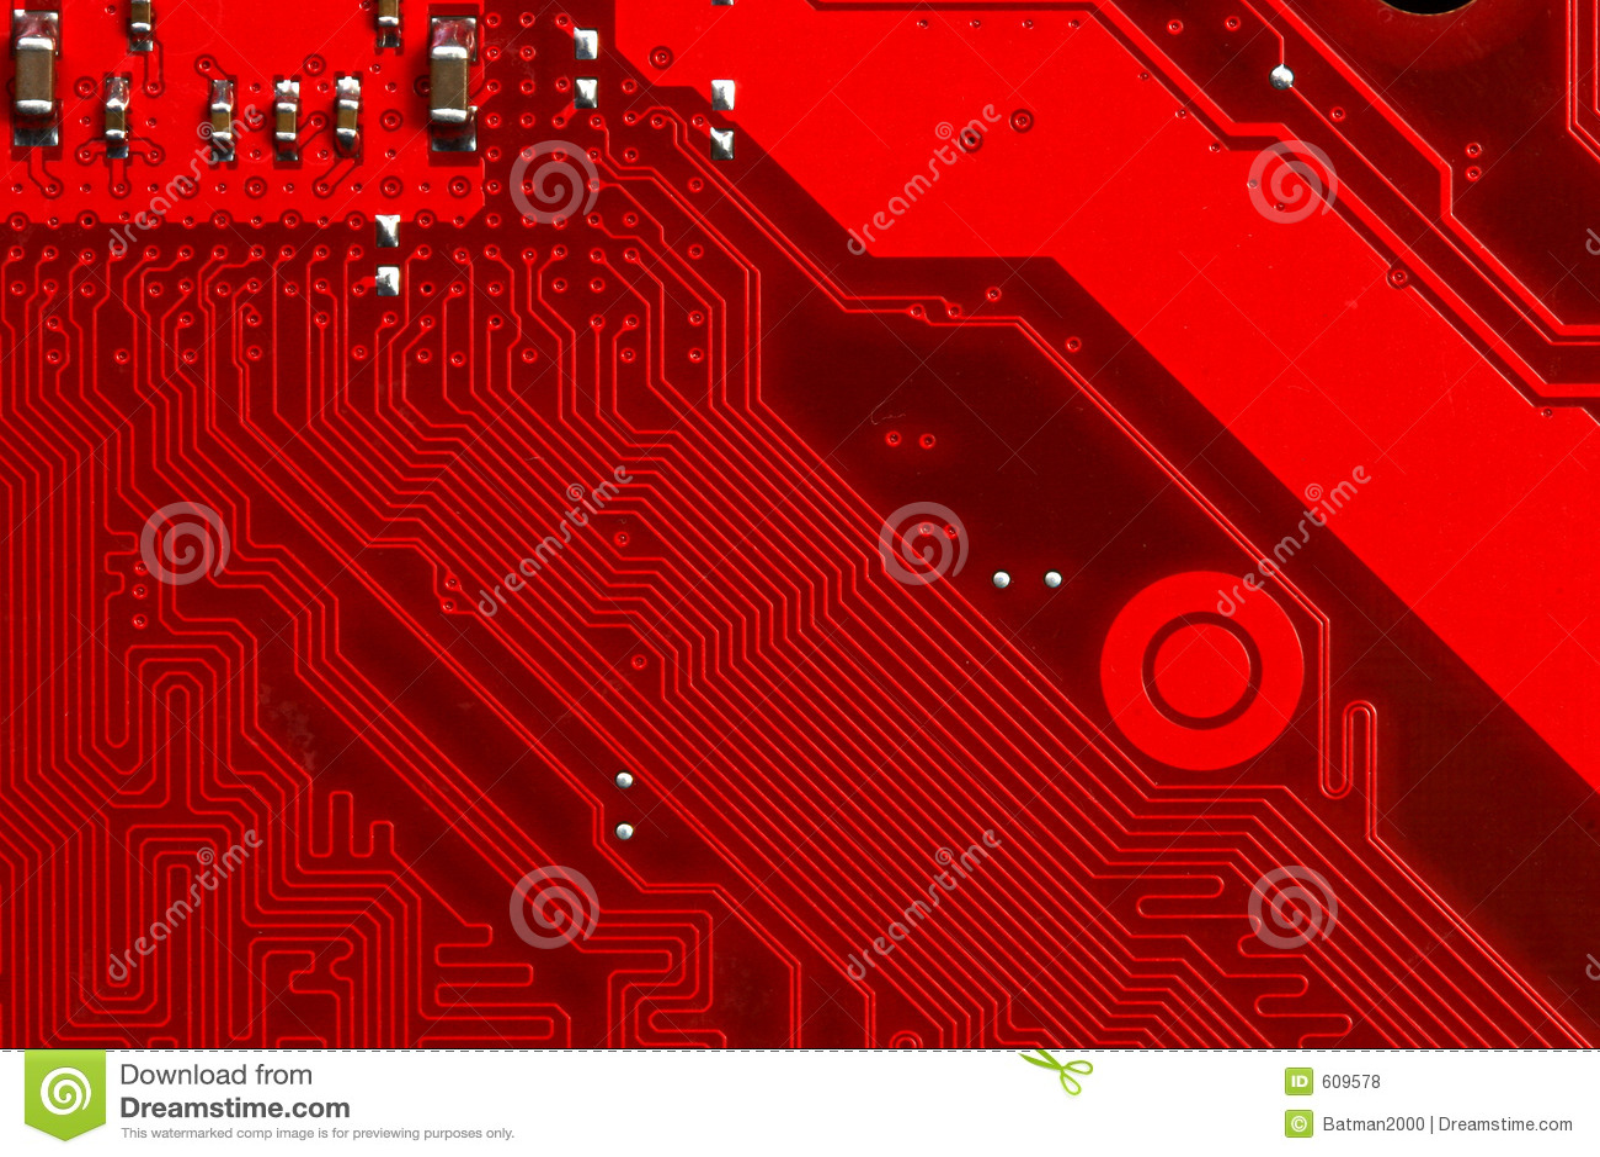 Motherboard ontwerp